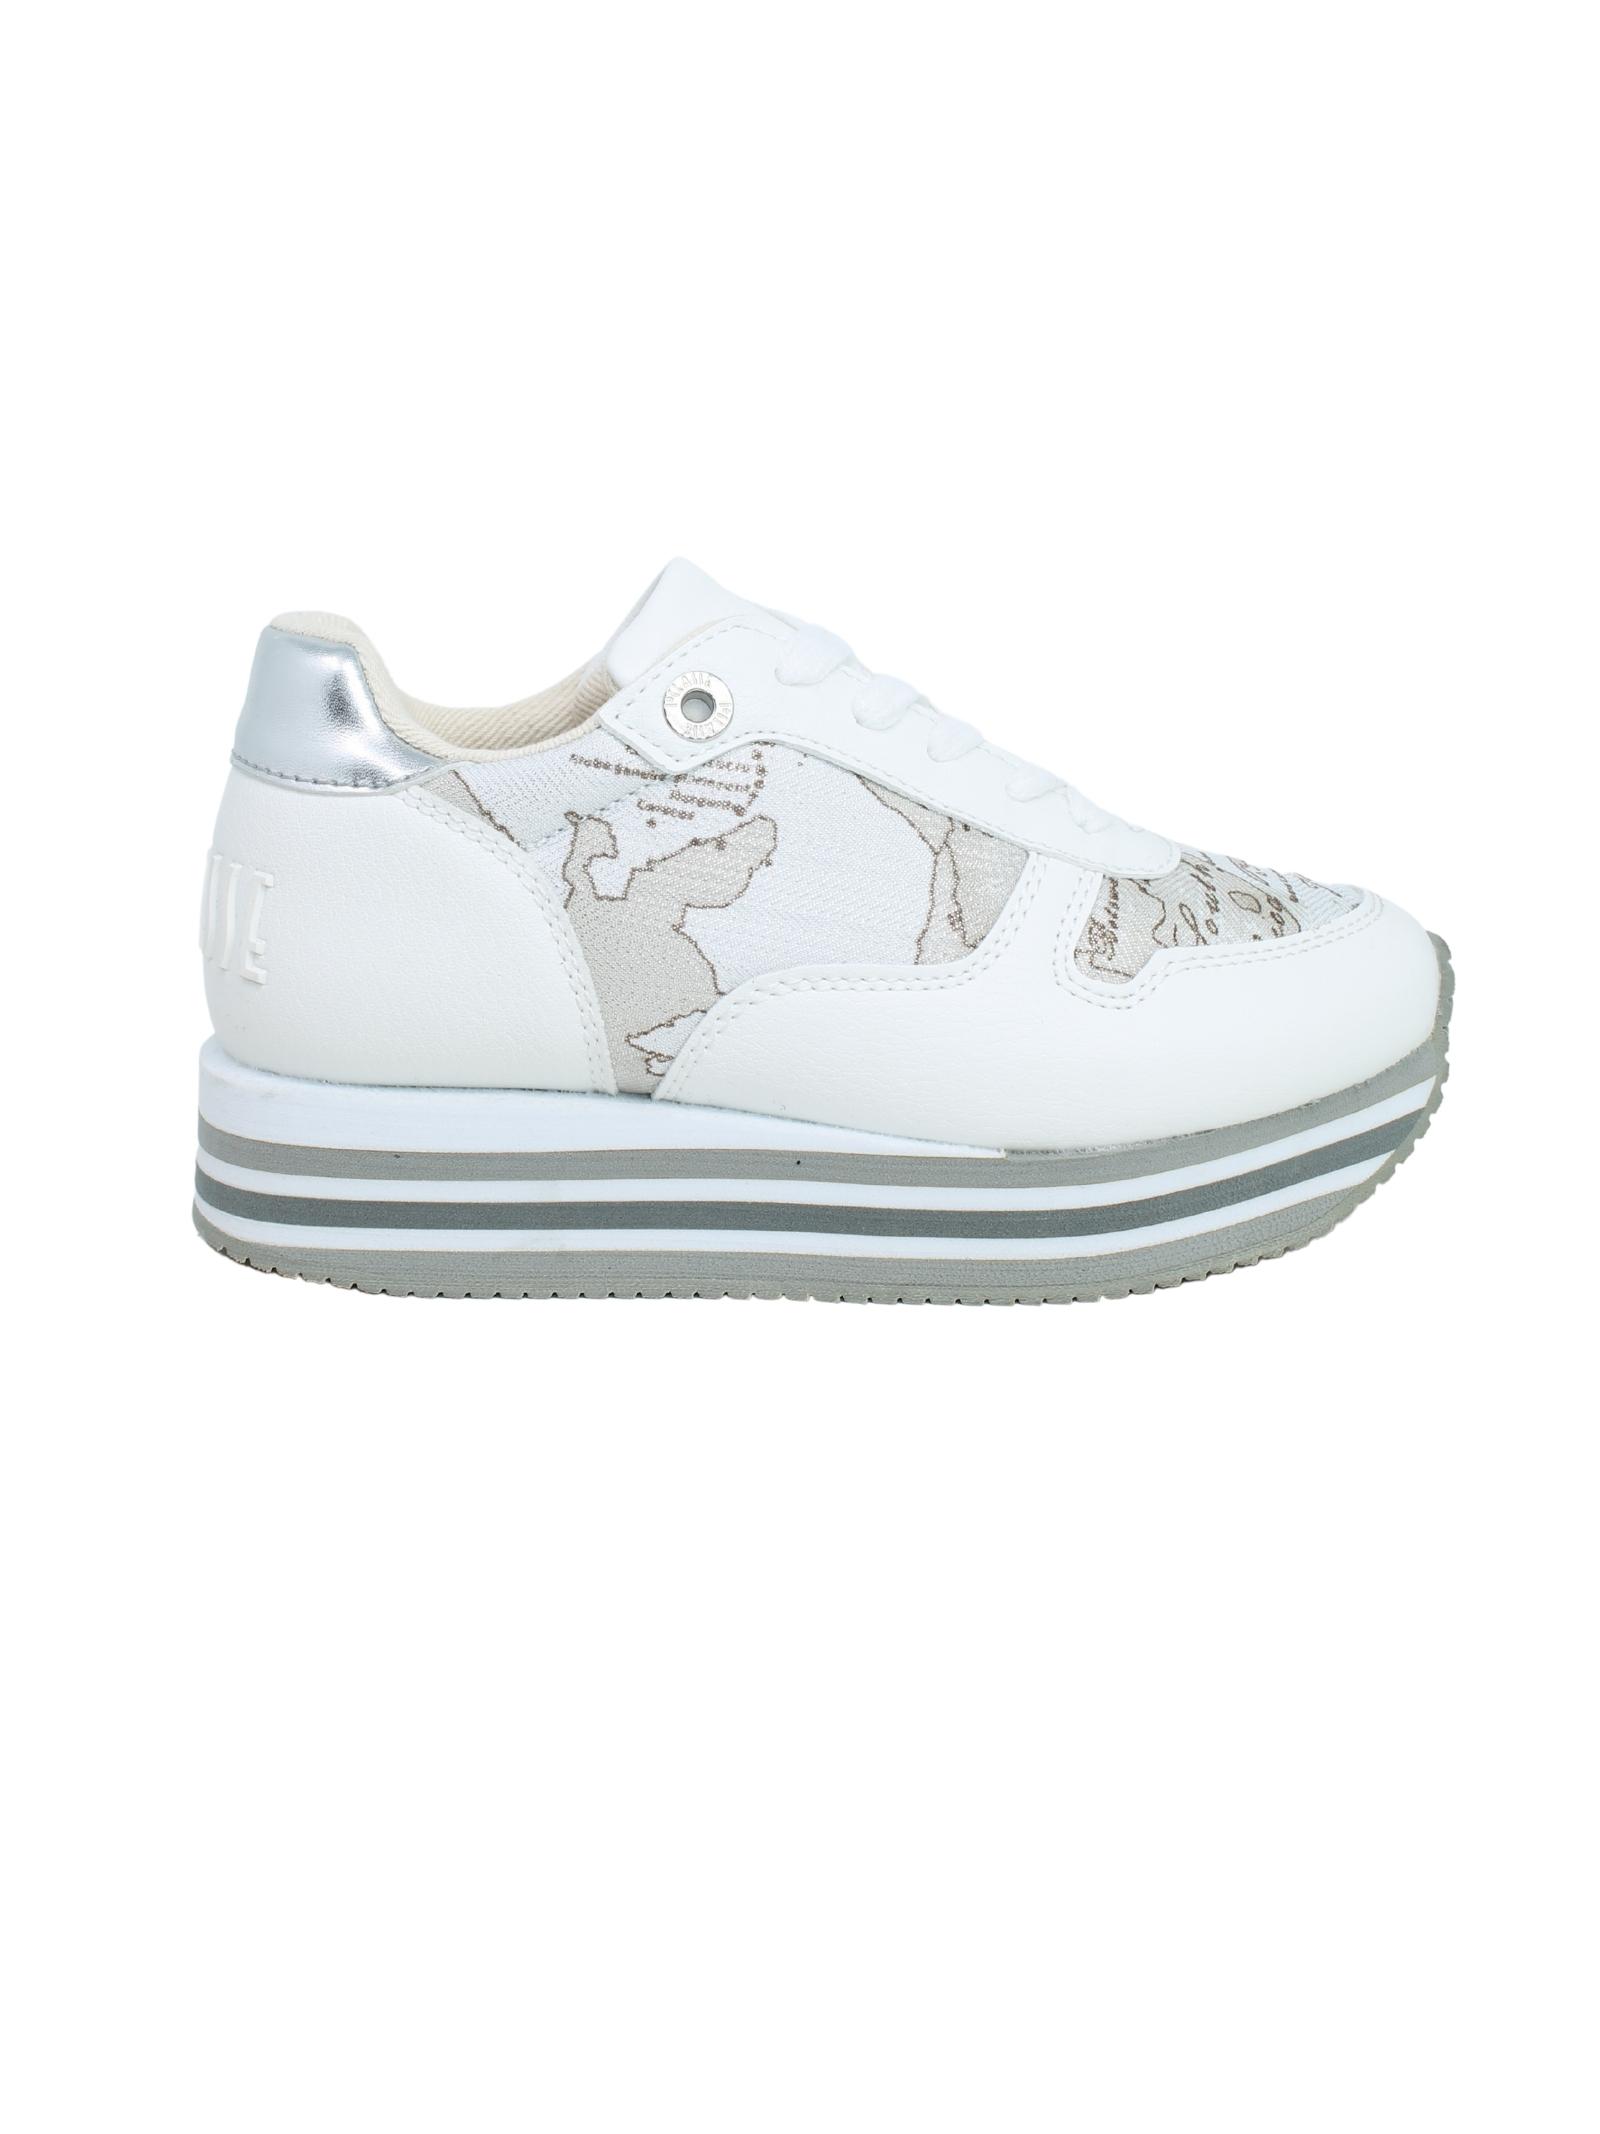 ALVIERO MARTINI 1° CLASSE JUNIOR | Sneakers | P3A4-10562-0558X018